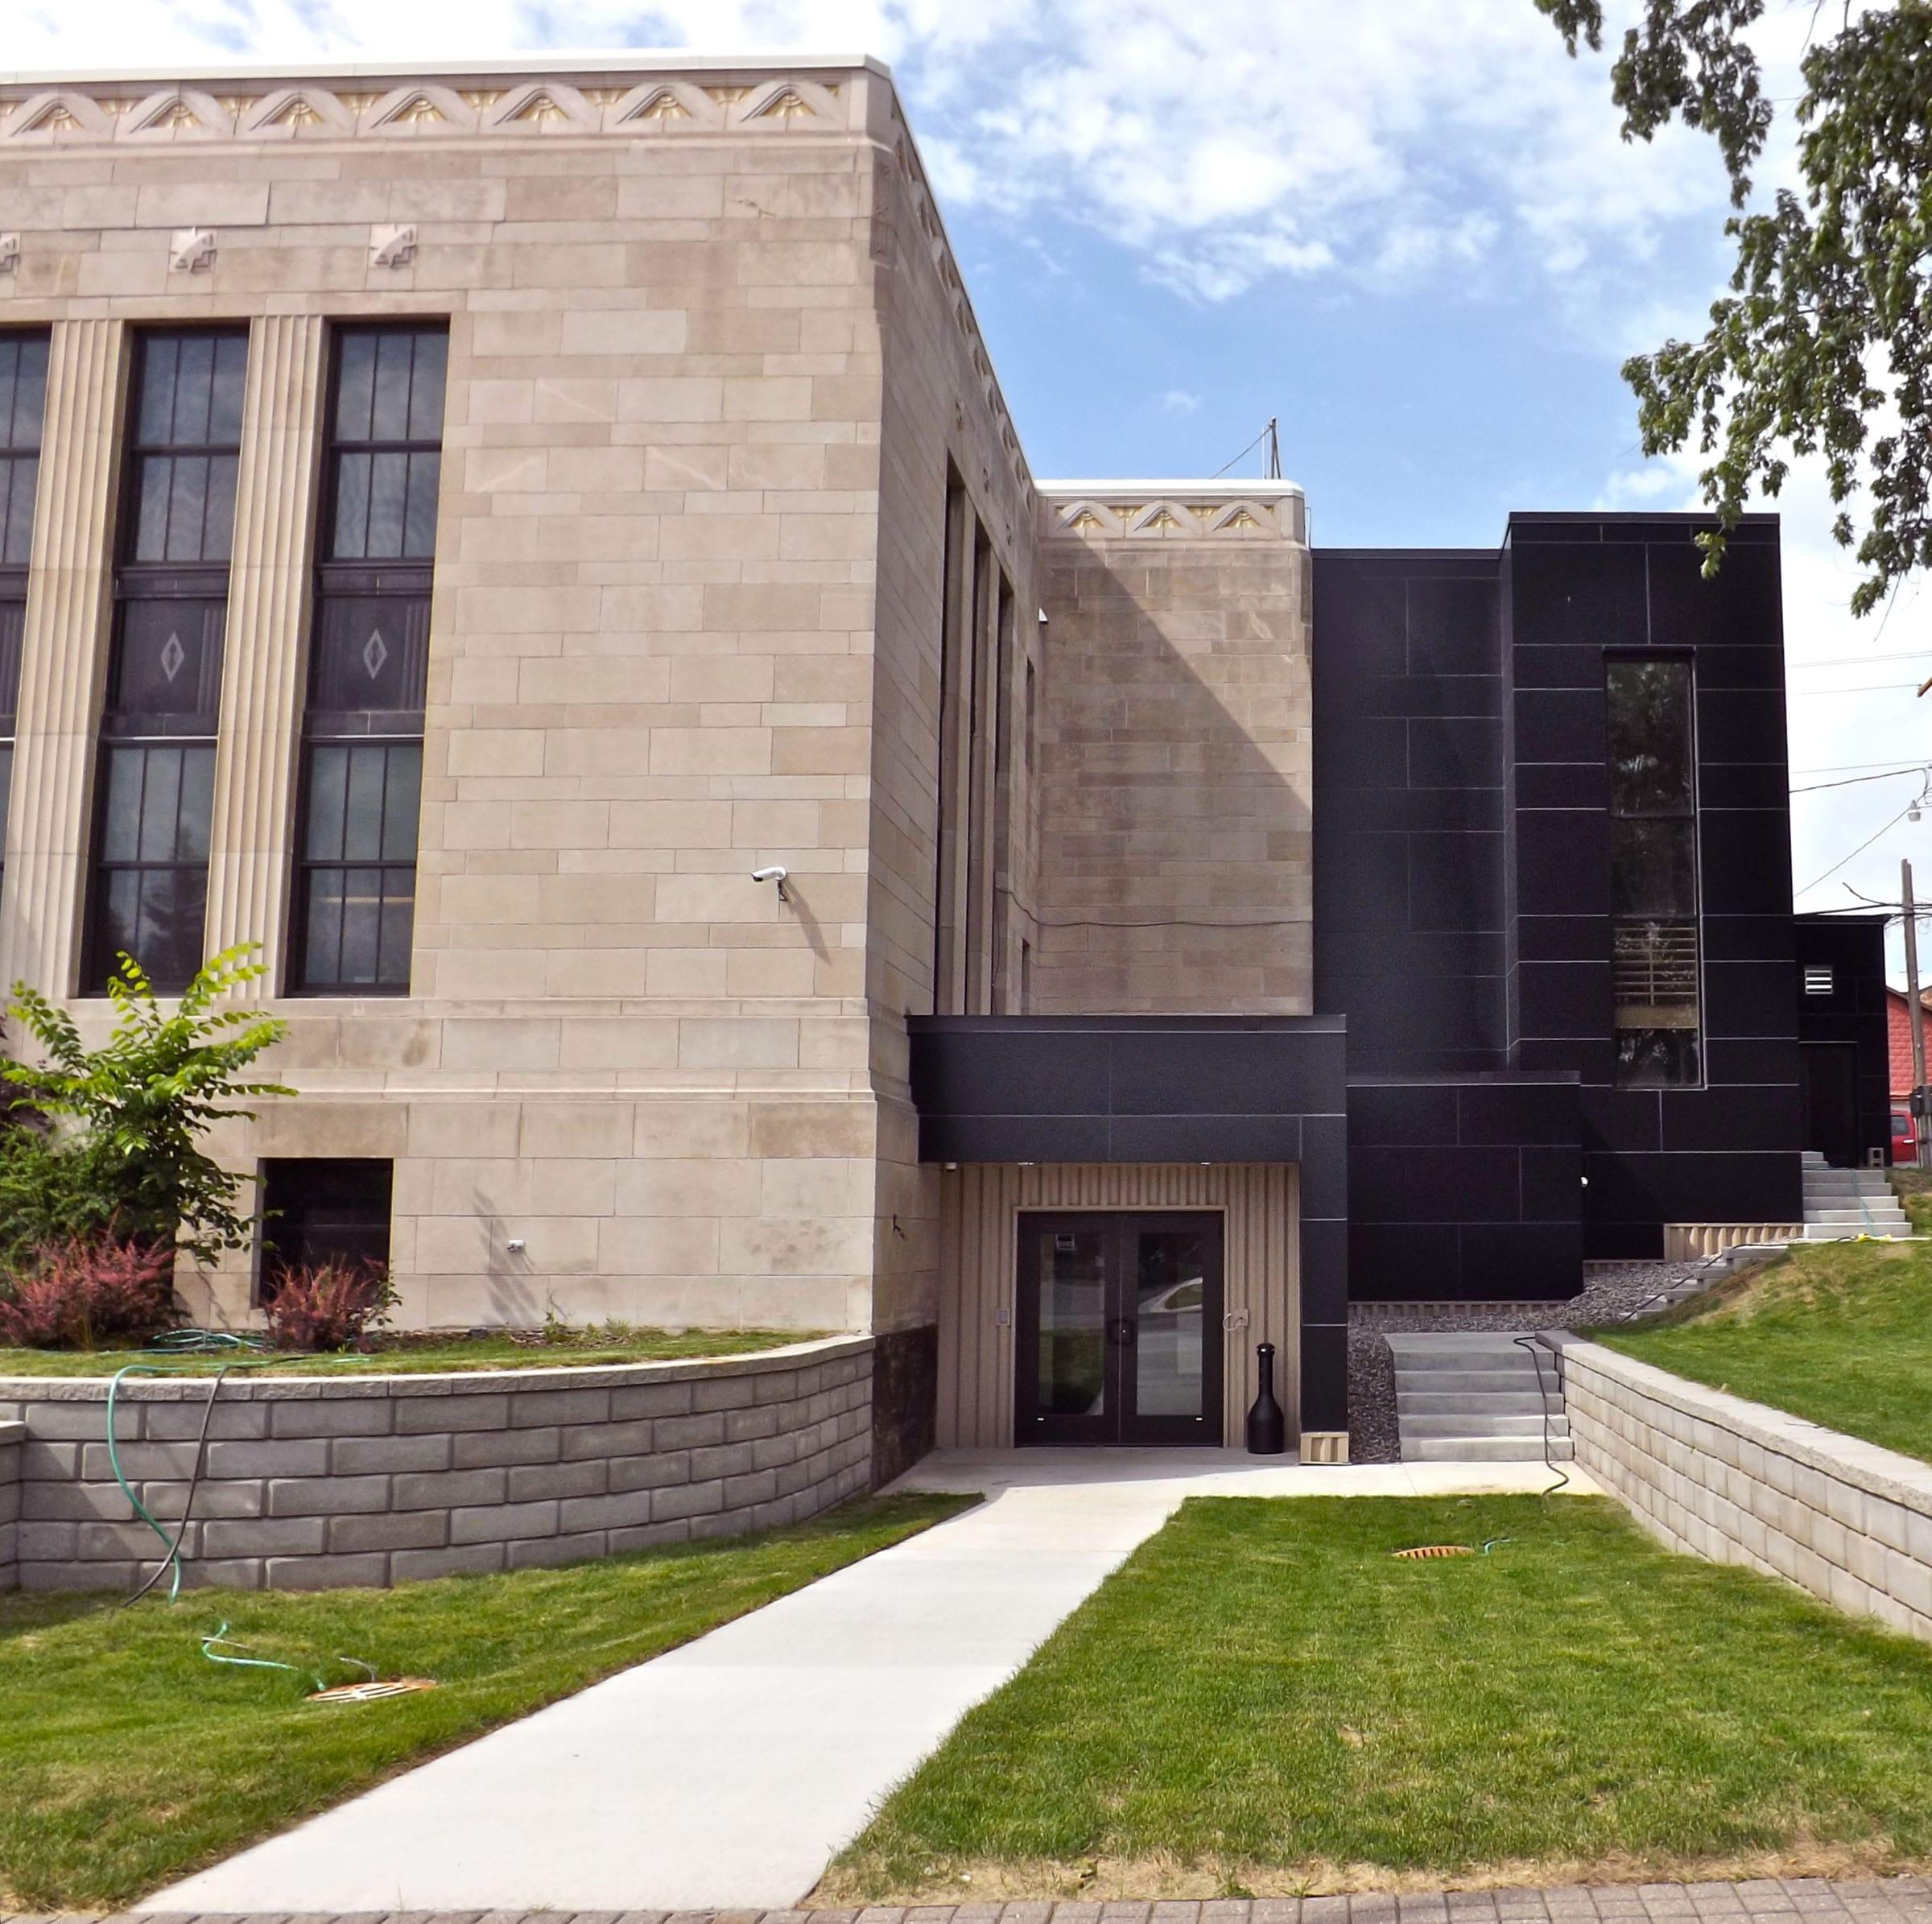 Ely City Hall